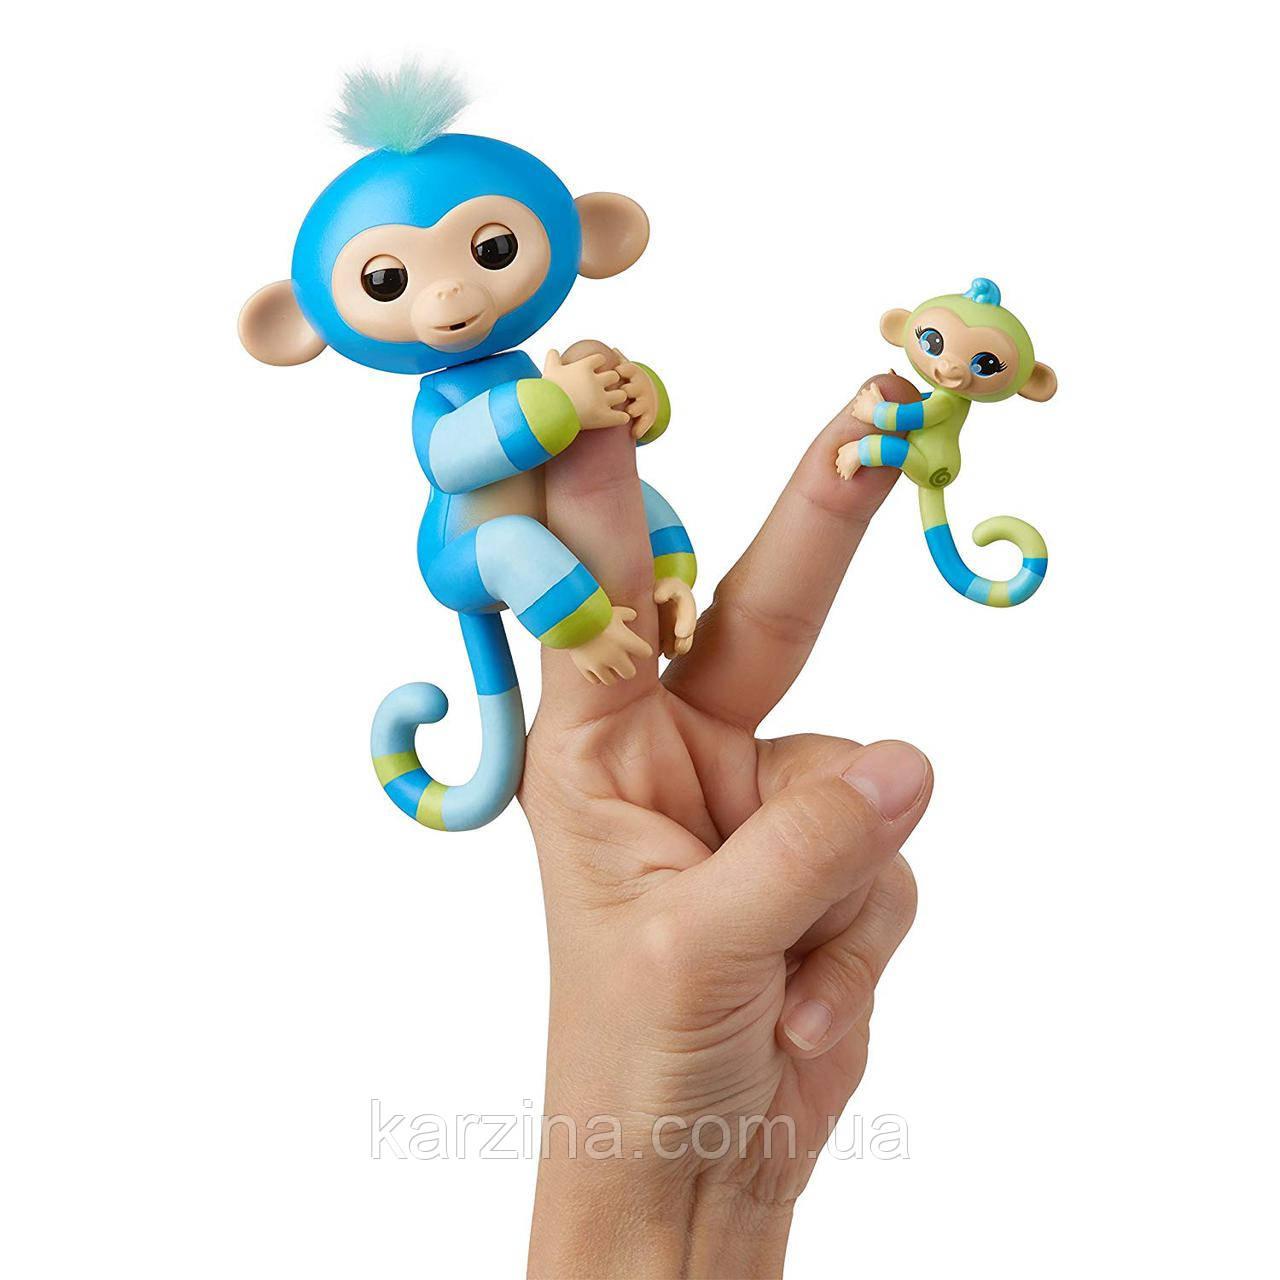 Обезьянки Fingerlings с другом 100% Оригинал WowWee Baby Monkey & Mini Bffs Billie & Aiden Билли и Айден